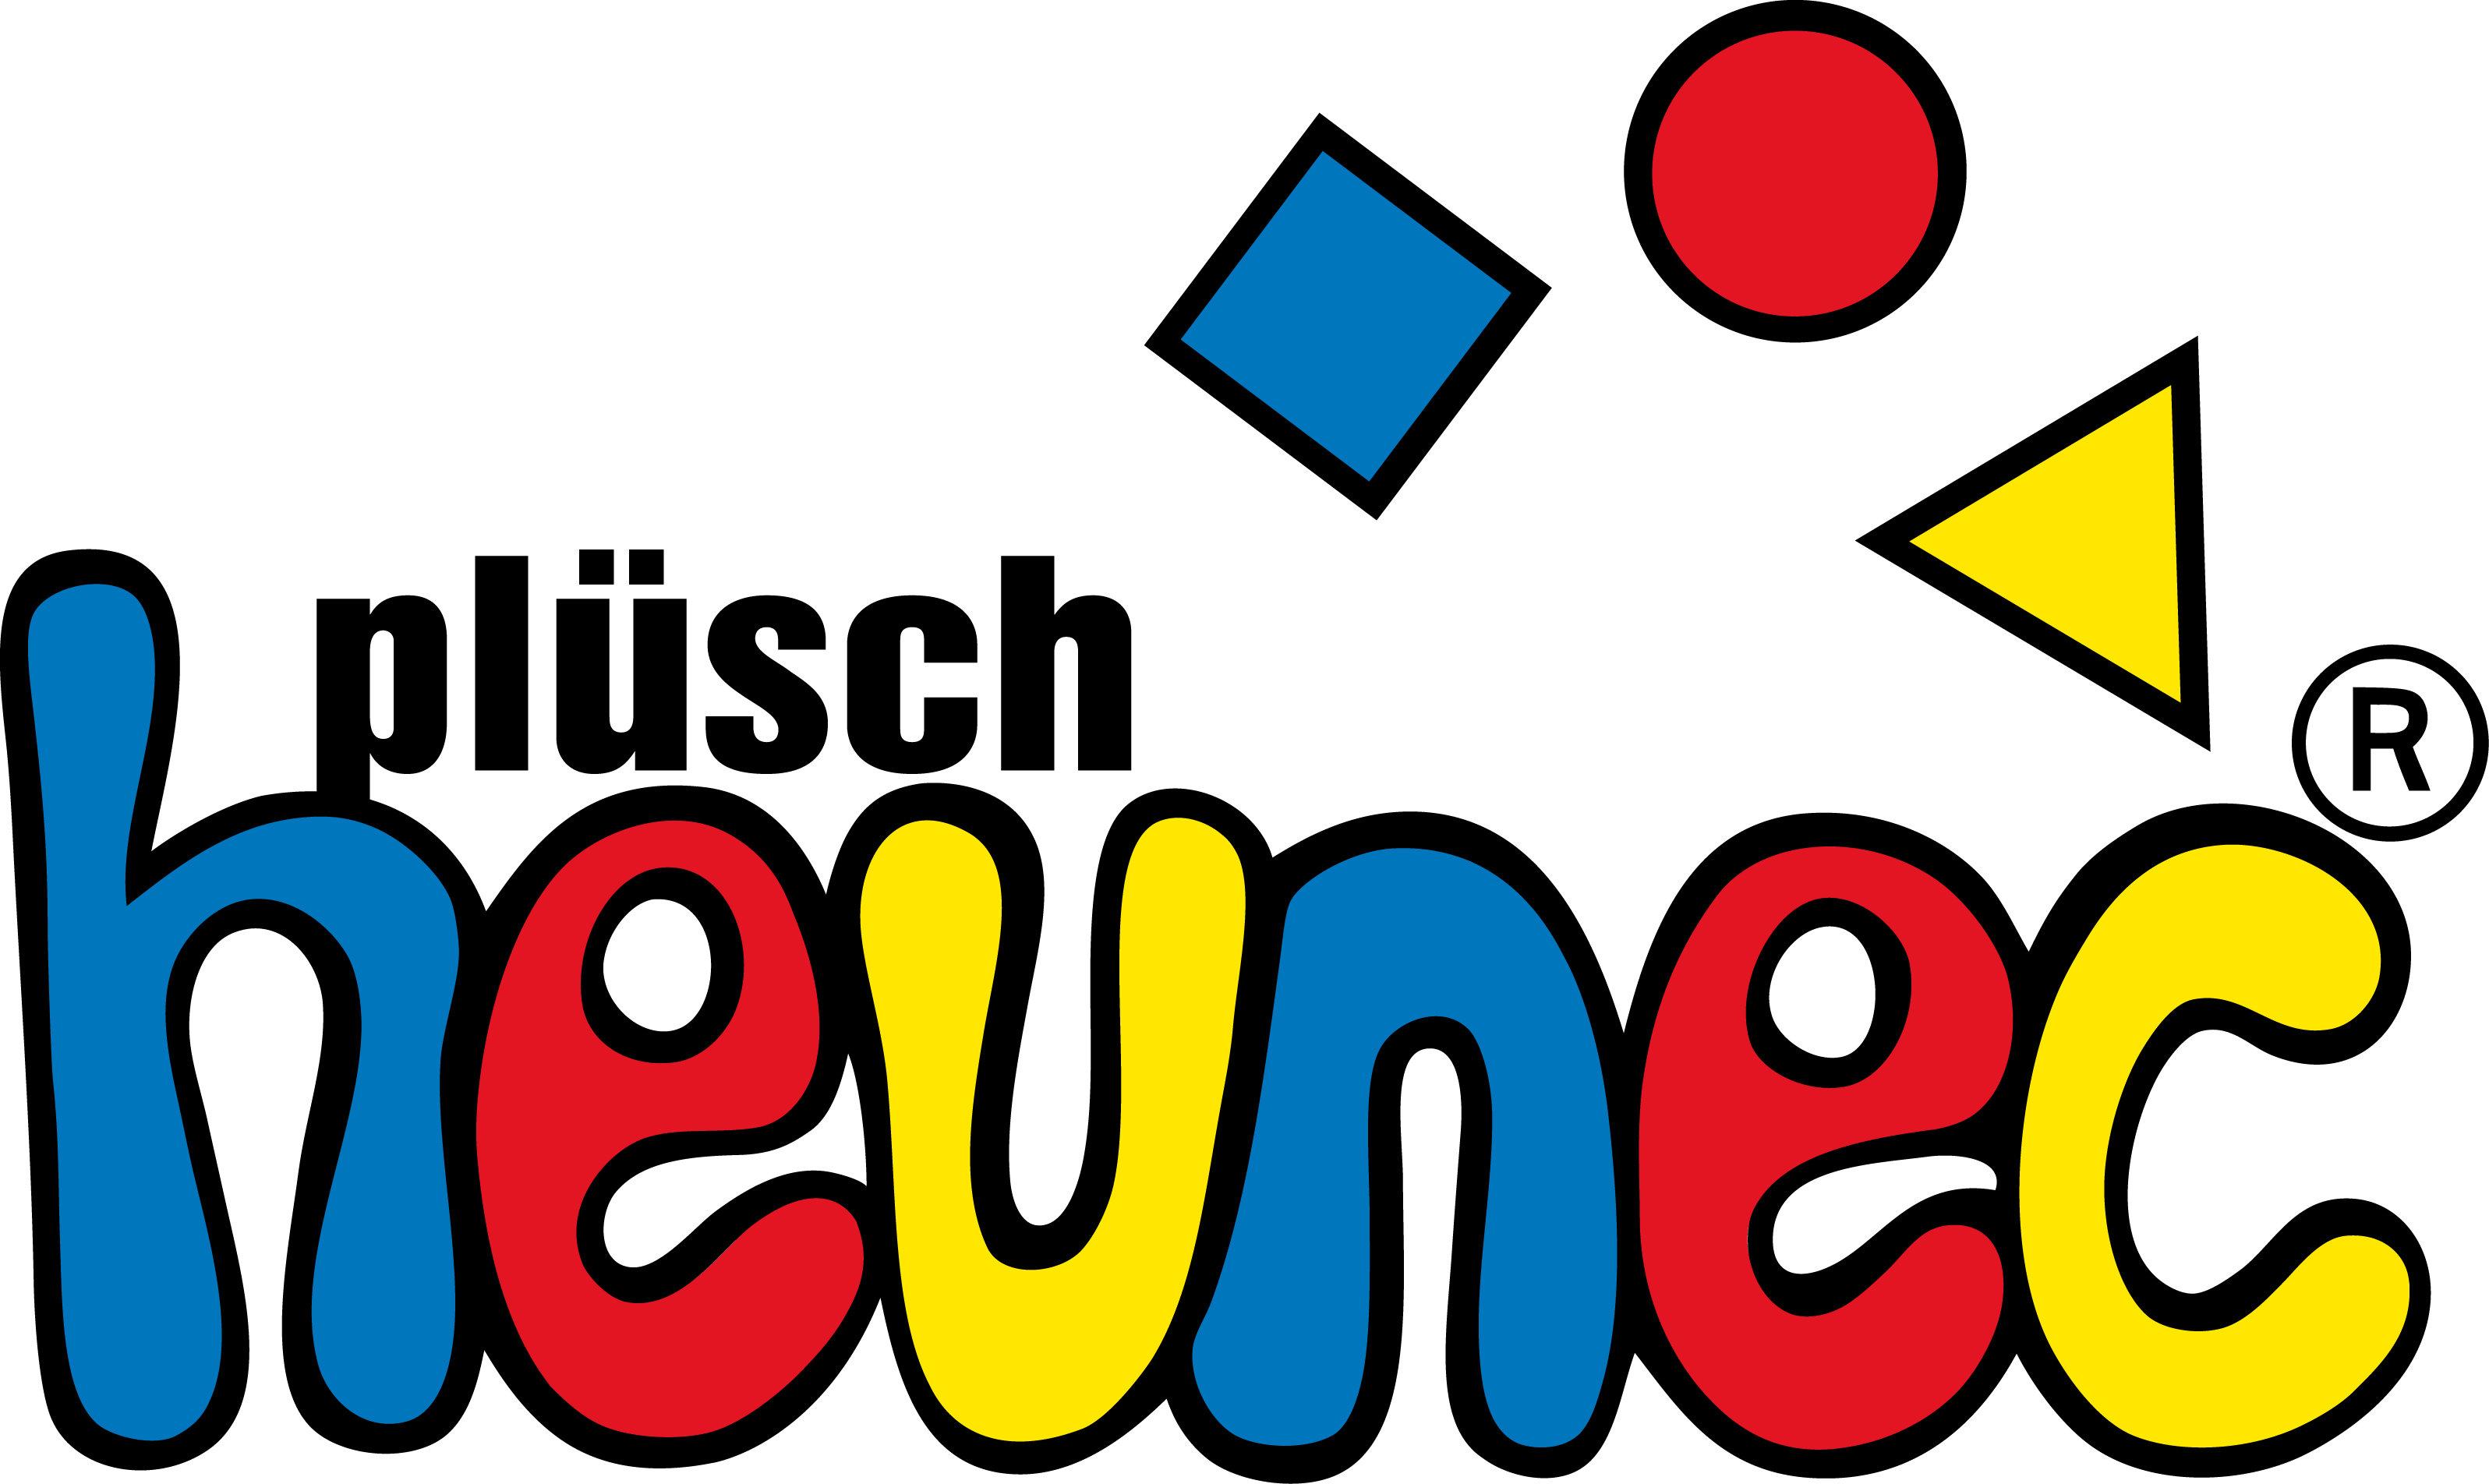 Plüsch Heunec